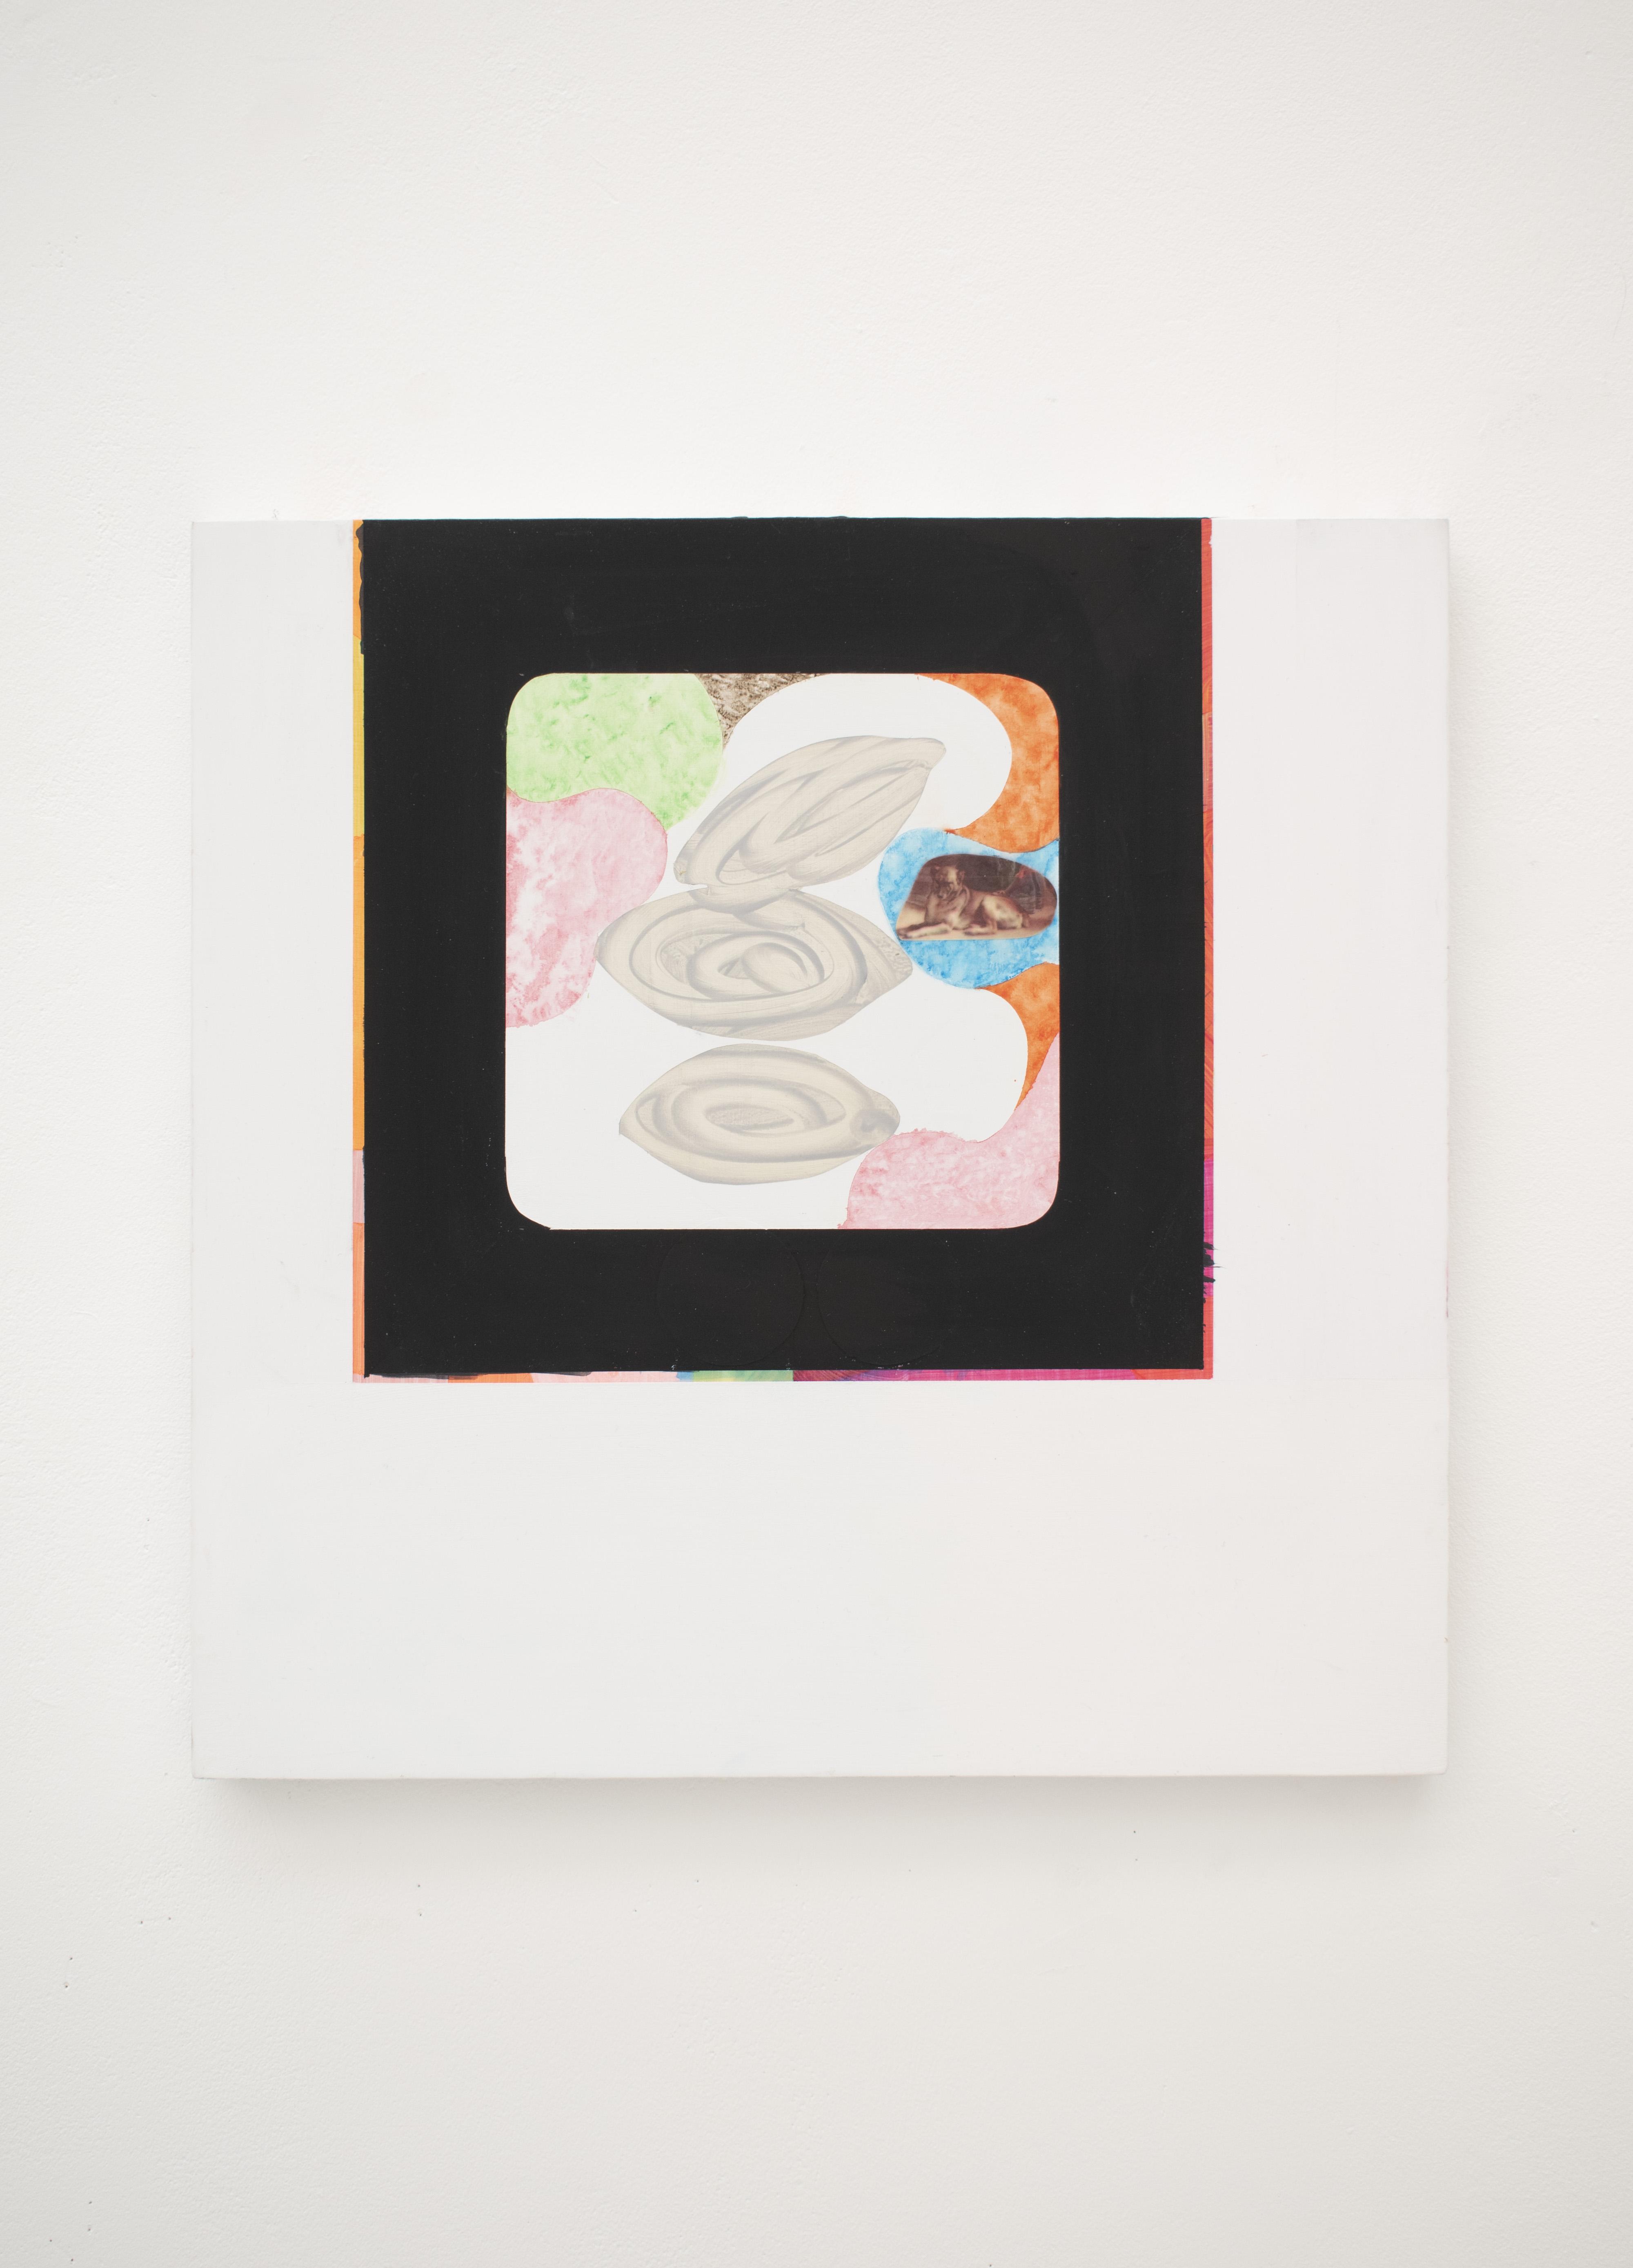 Eye Story 2021 Acrylic and paper on Aluminium, 48cm x 48cm